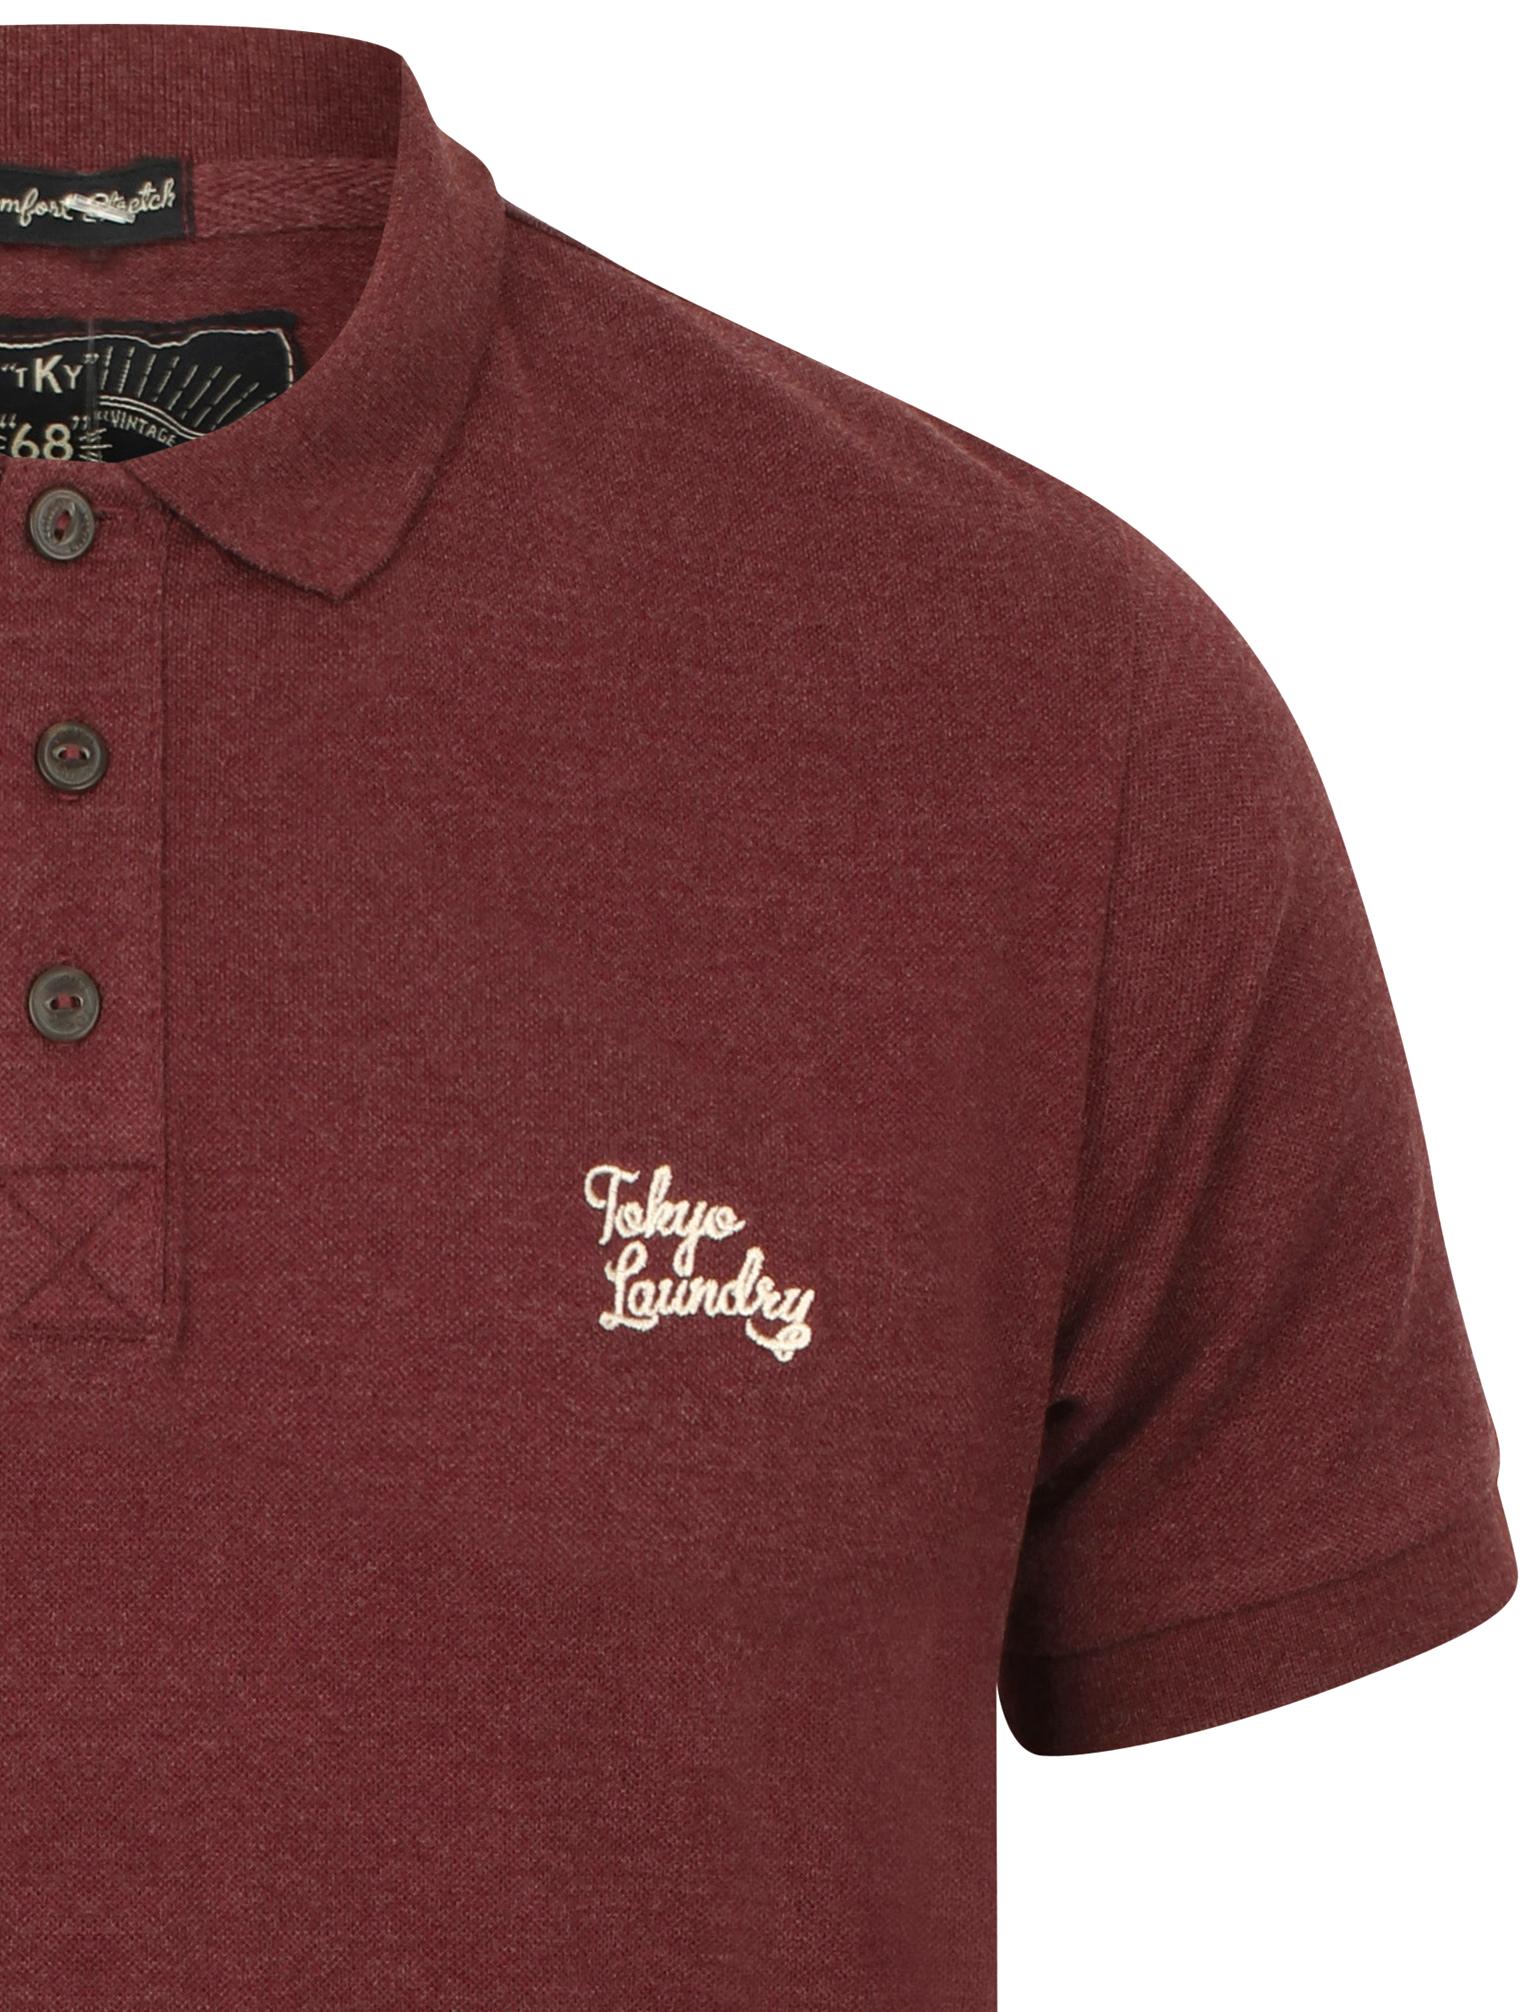 New-Mens-Tokyo-Laundry-Branded-Kuusamo-Cotton-Rich-Pique-Polo-Shirt-Size-S-XXL thumbnail 23